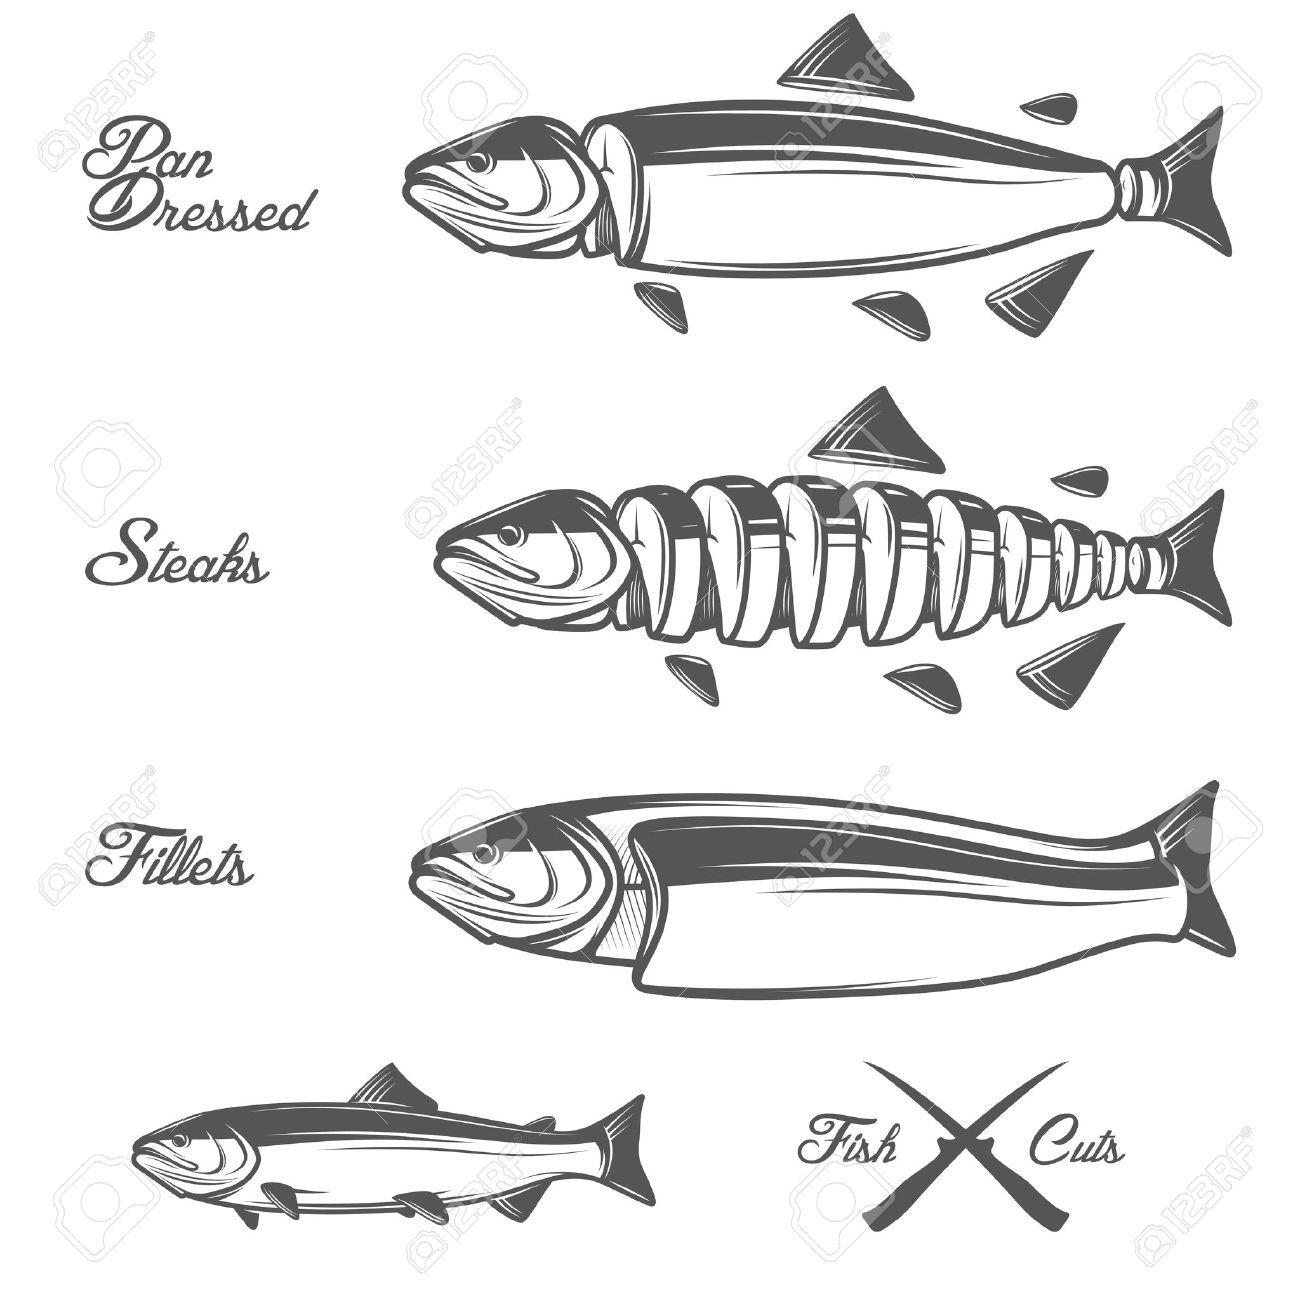 Stock Vector Fish, Fillet, Stock vector